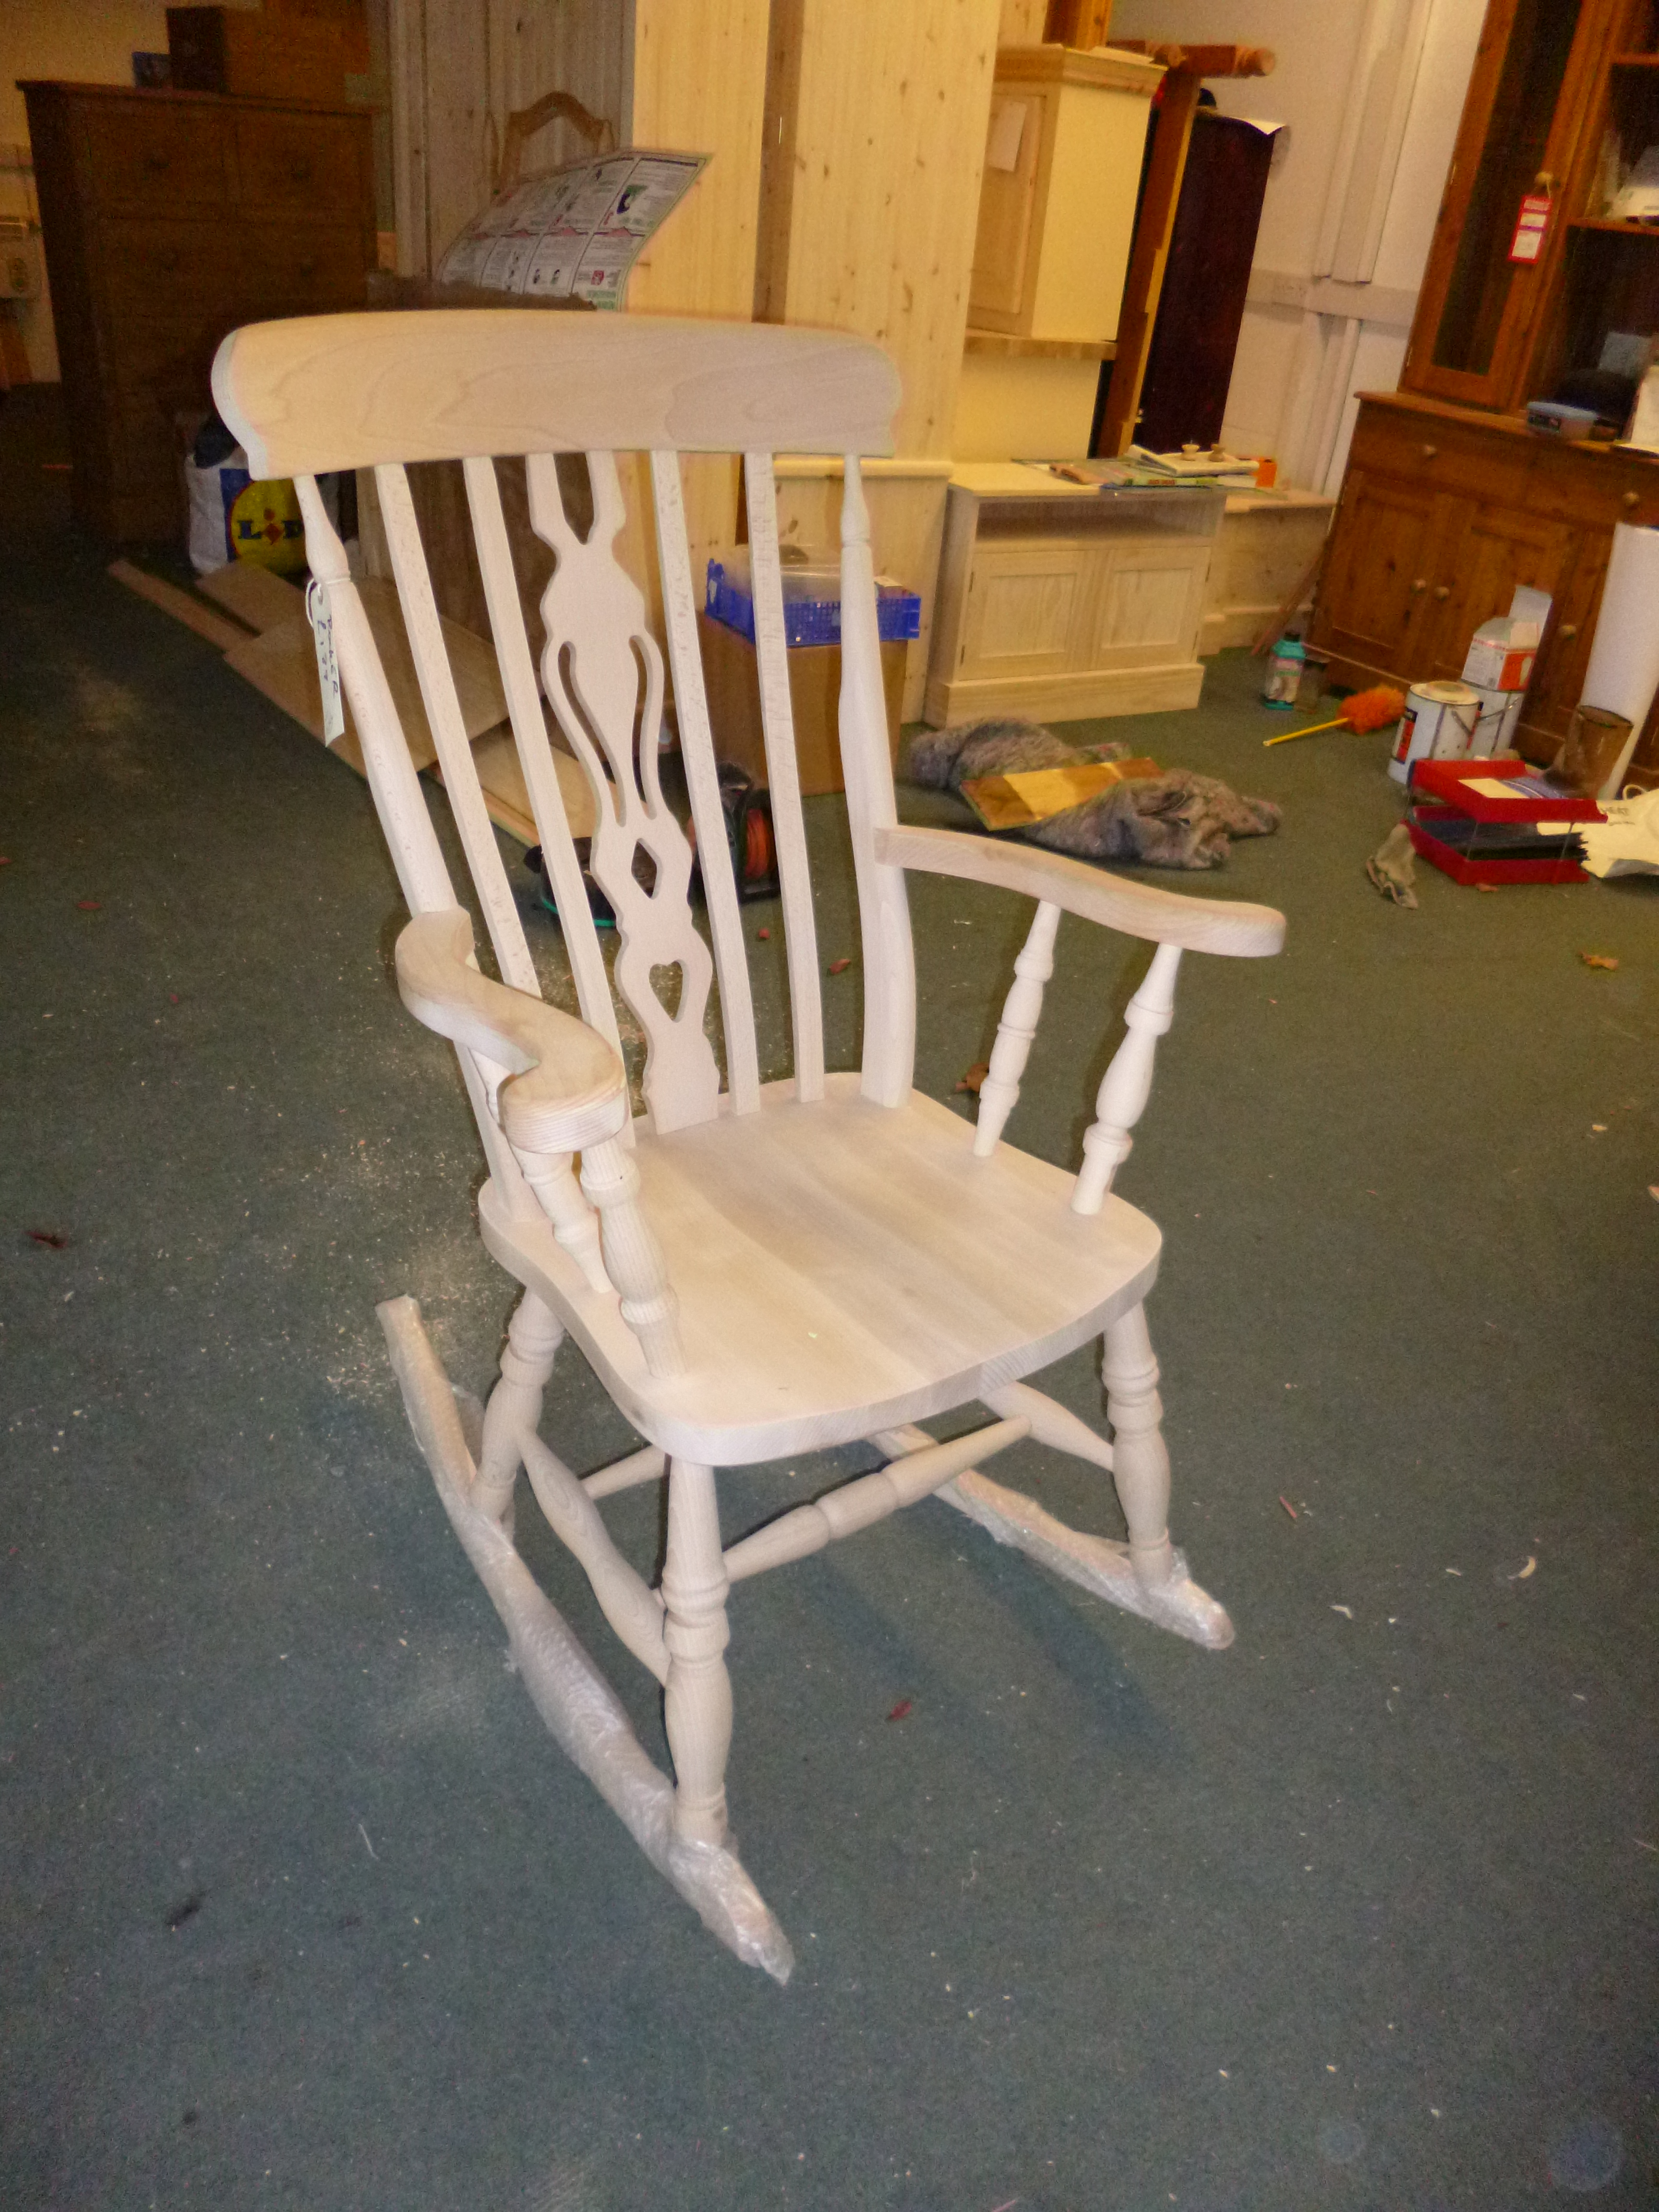 Super B Chairs And Stools Town Country Furniture Kenilworth Inzonedesignstudio Interior Chair Design Inzonedesignstudiocom